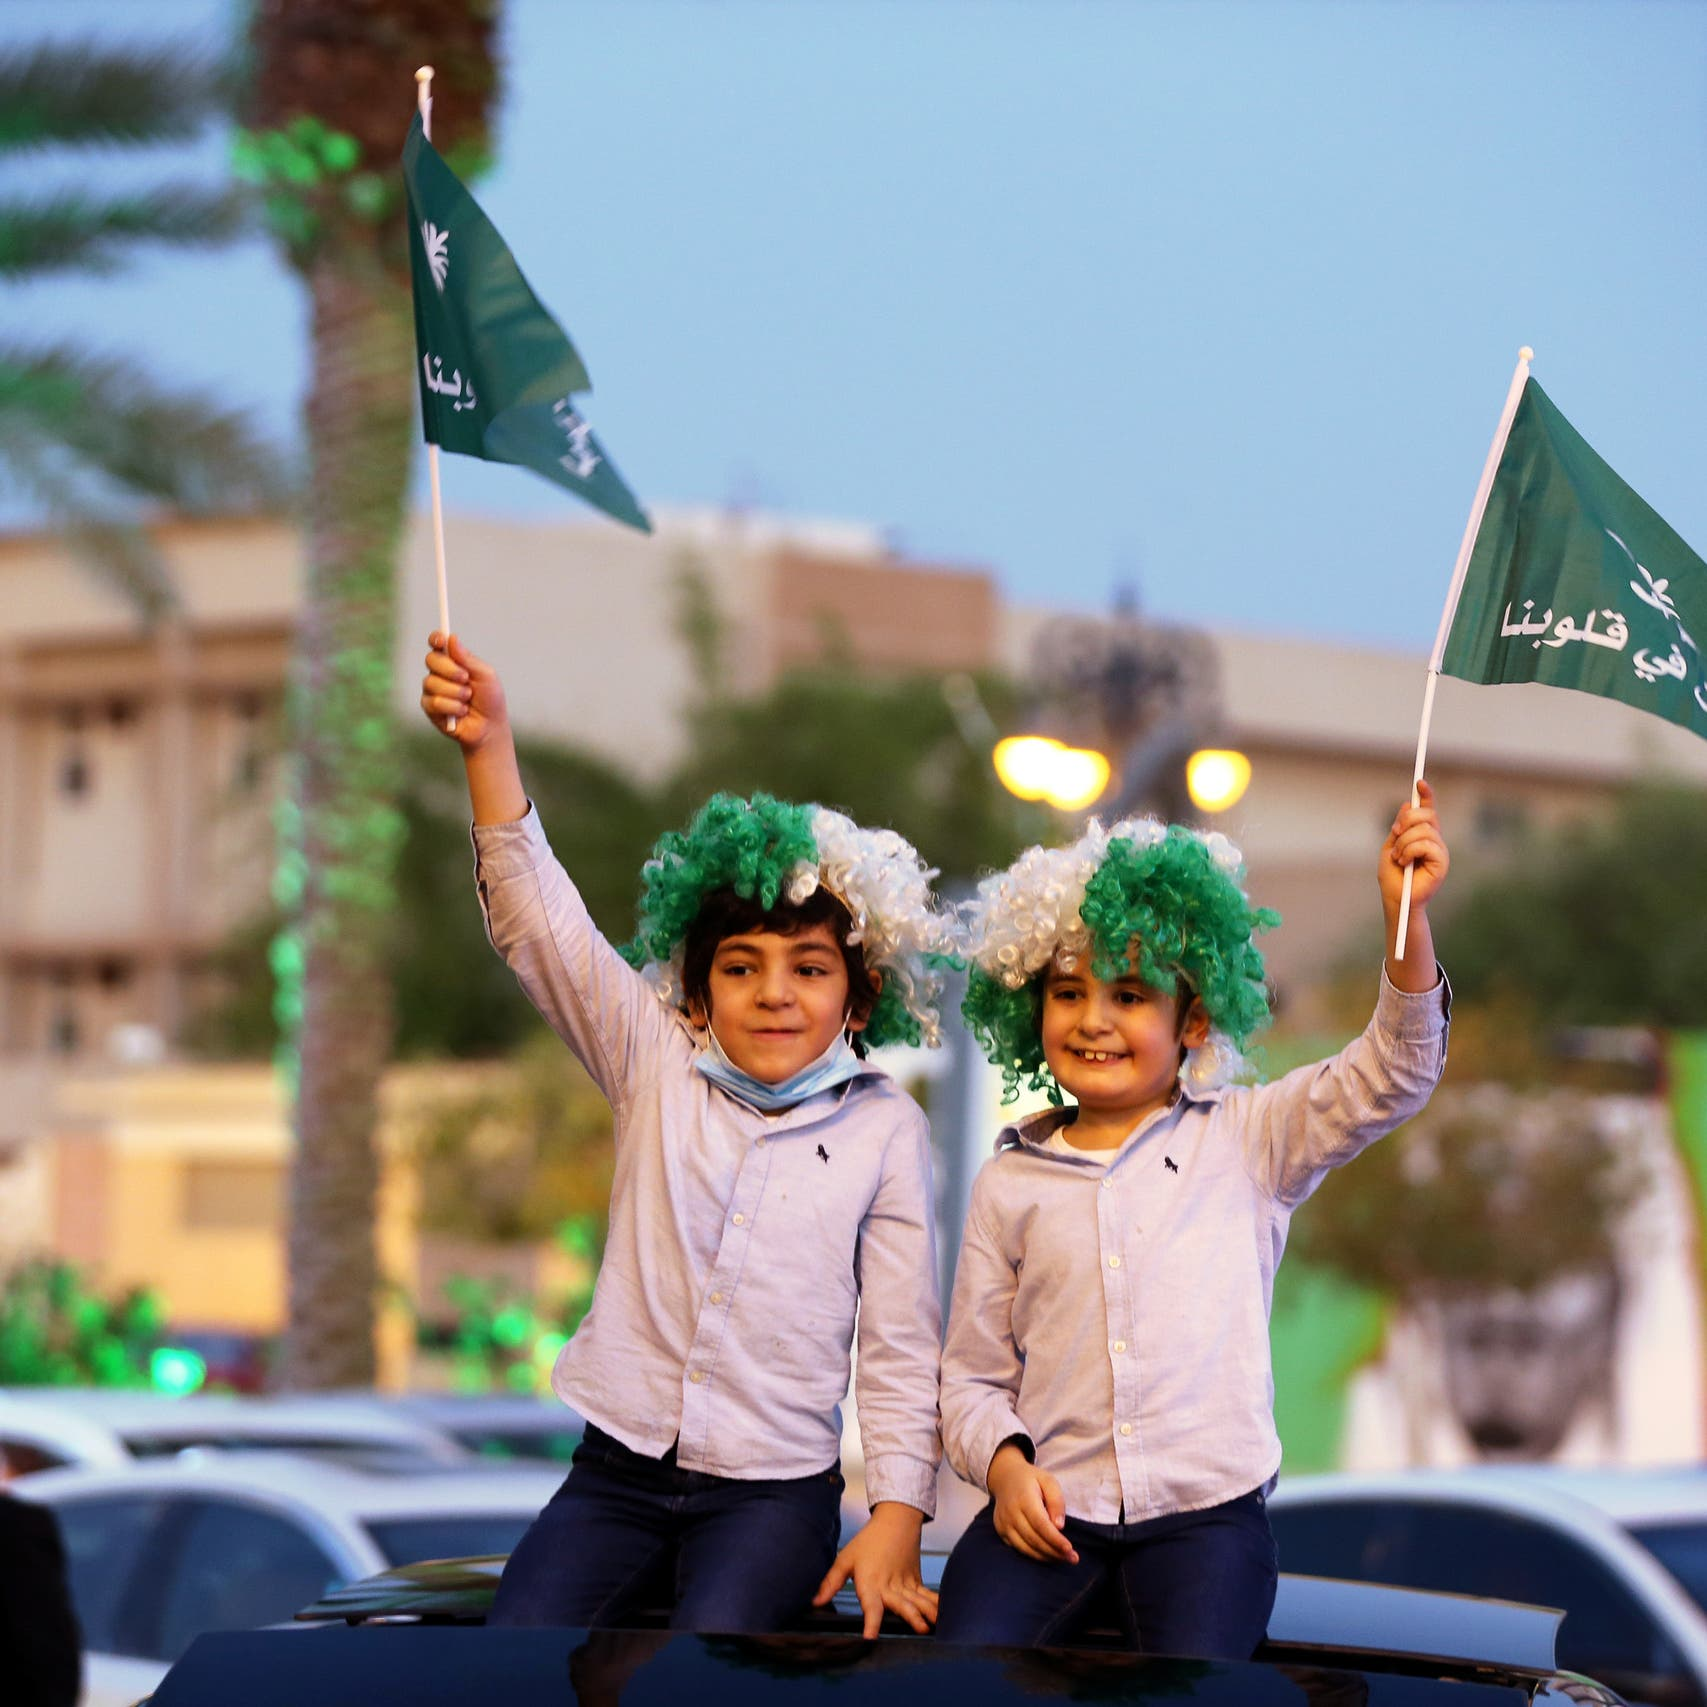 Fireworks and concerts: Saudi Arabia kicks off National Day with massive celebrations